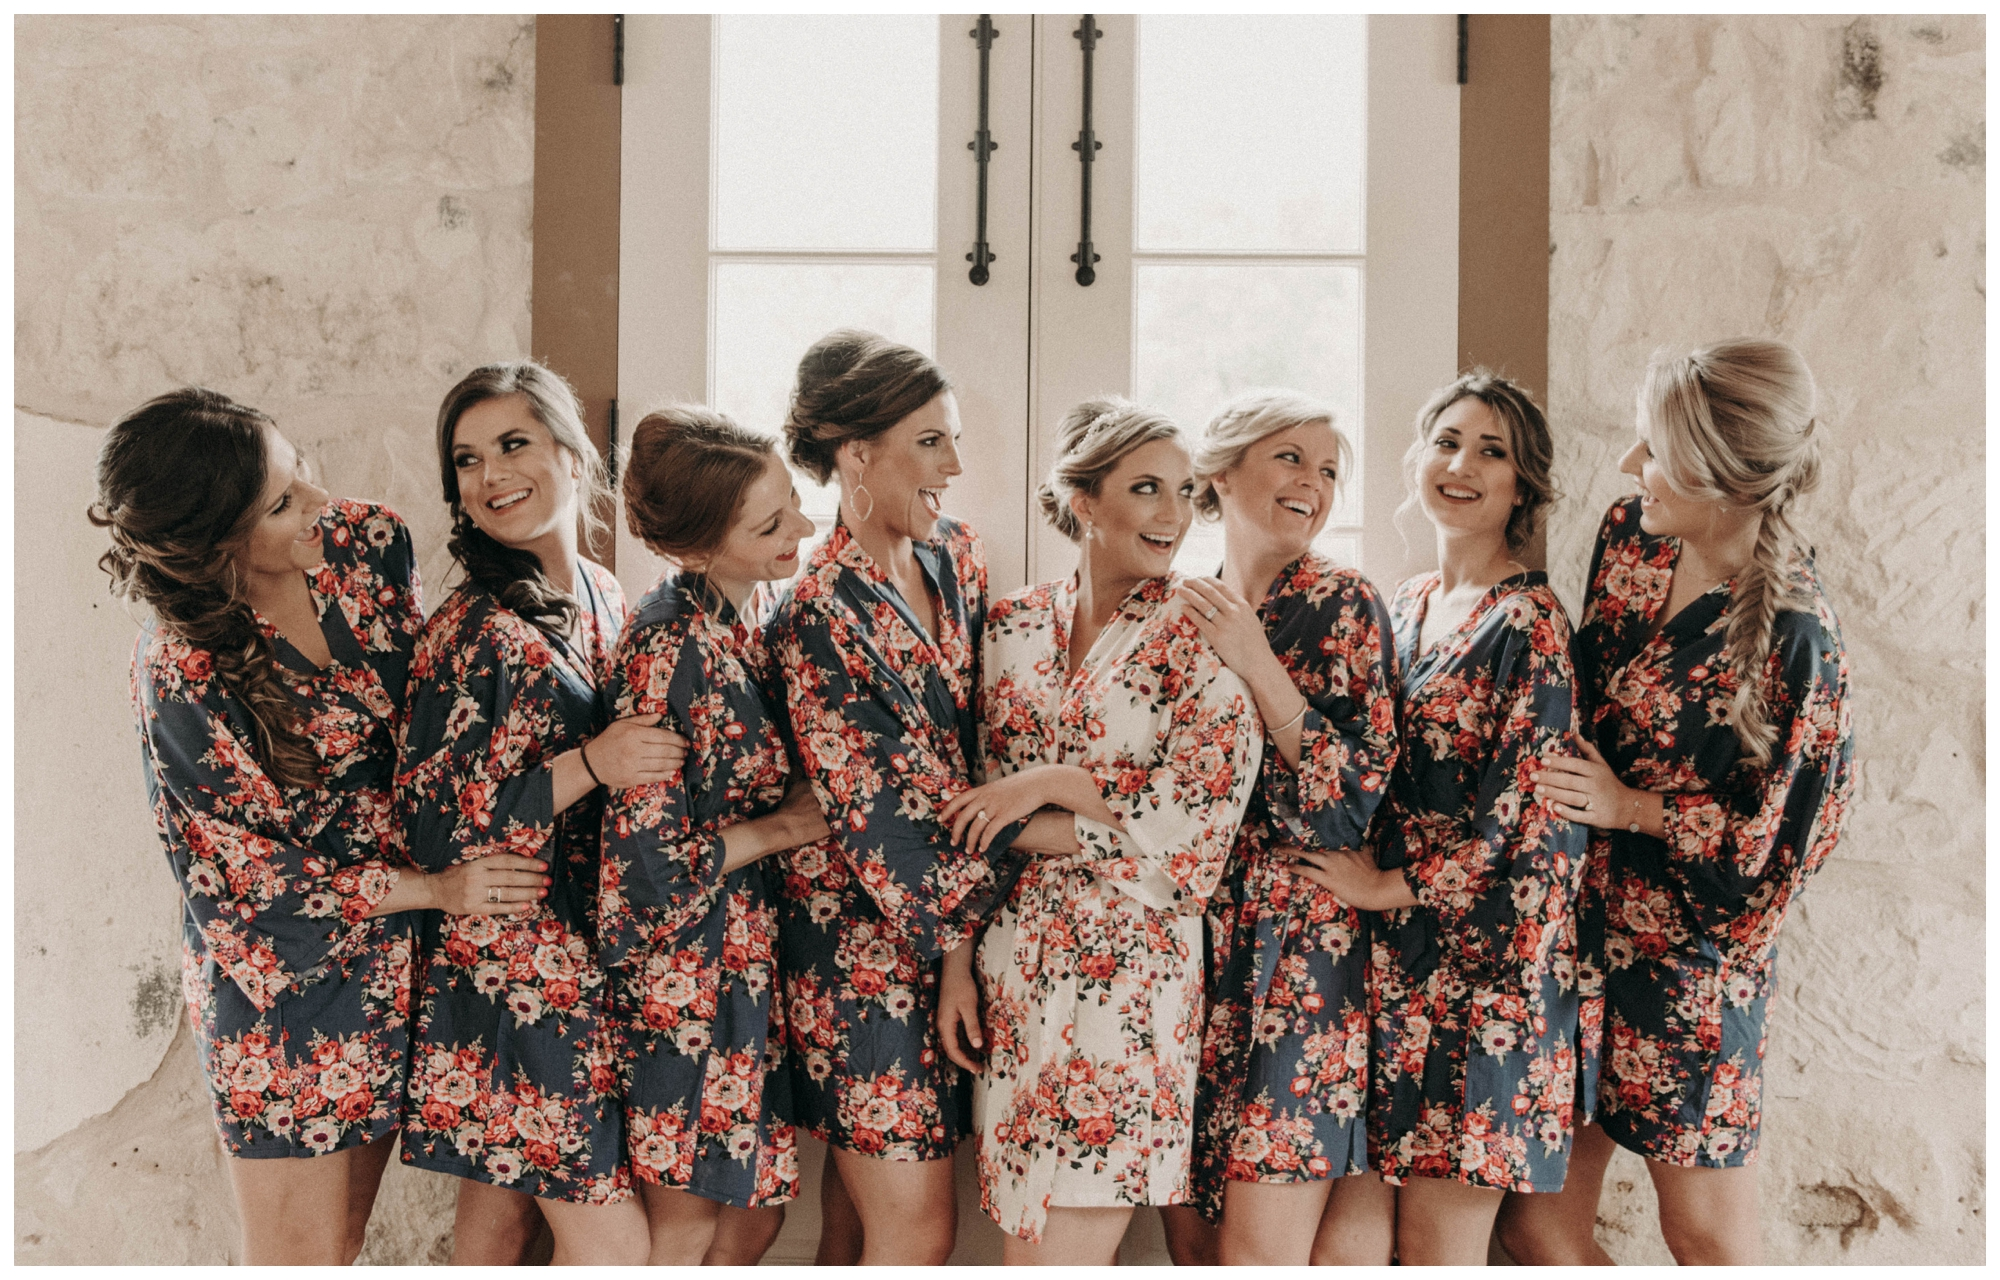 austin-texas-wedding-photography-1778-photographie_0012.jpg